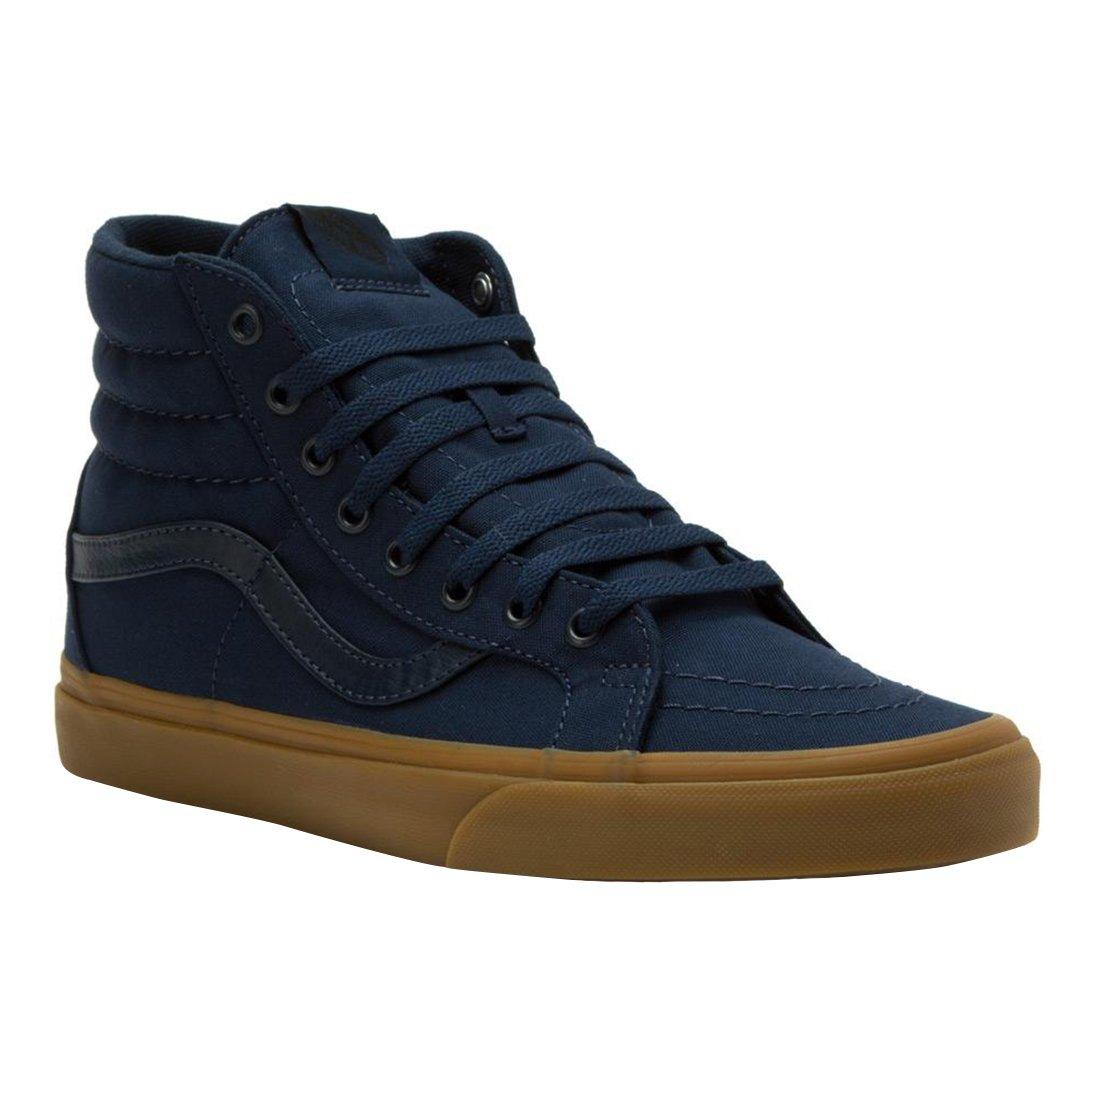 86f02780a0 Galleon - Vans Mens SK8-Hi Reissue Sneaker Dress Blues Light Gum Size 10